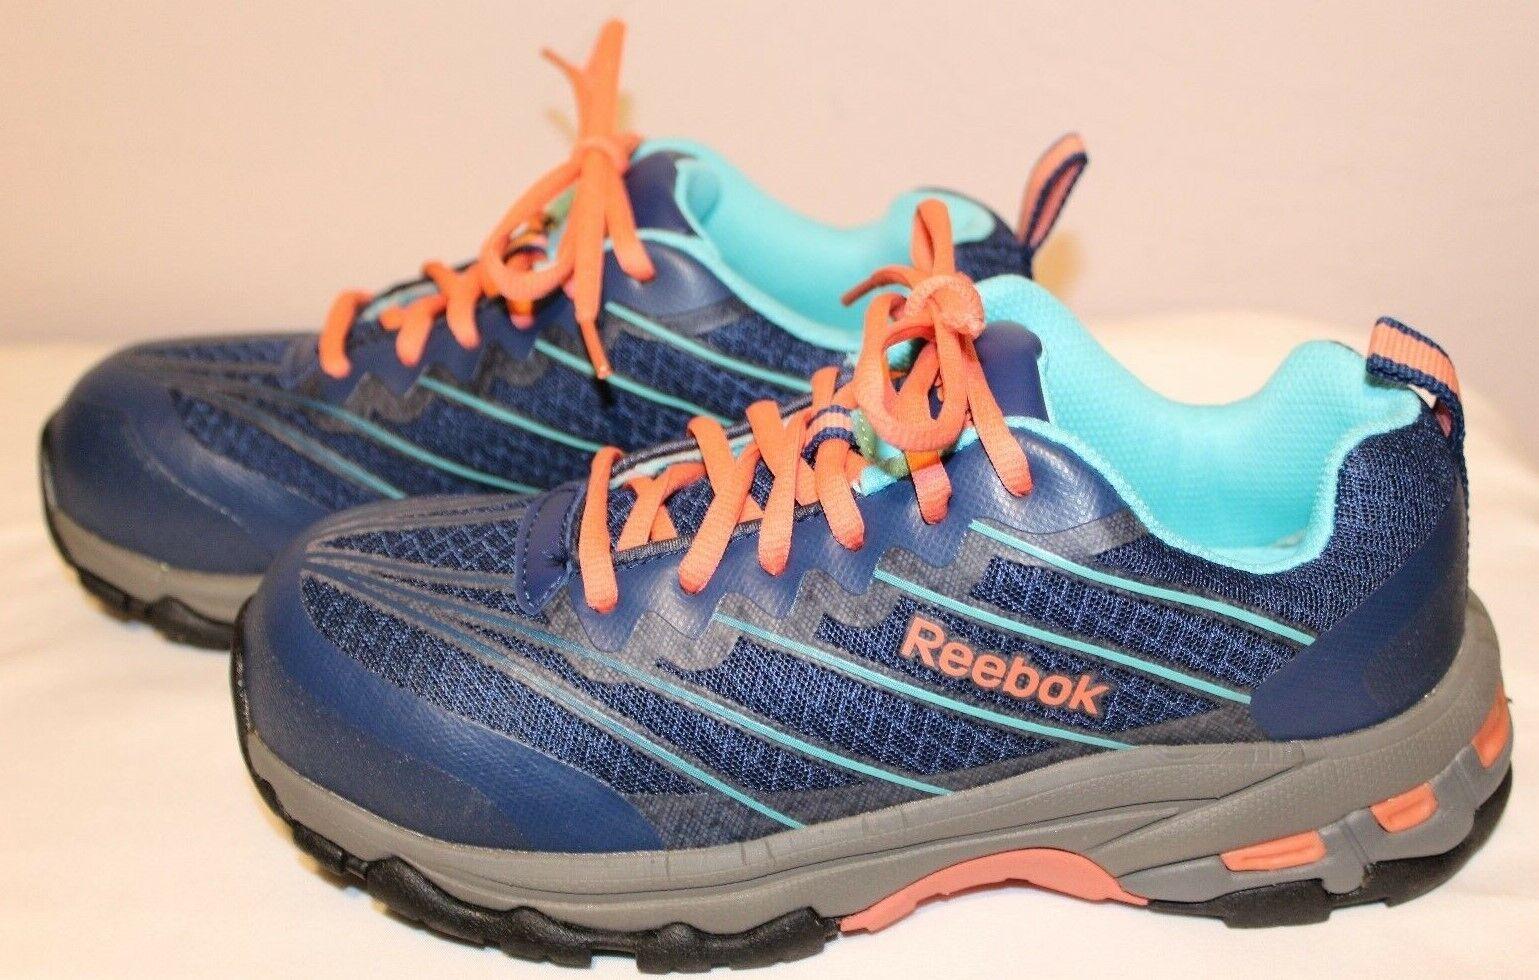 Reebok Work RB426 Exline Femme Indigo corail Comp Toe Athletic Oxford New 6.5 M